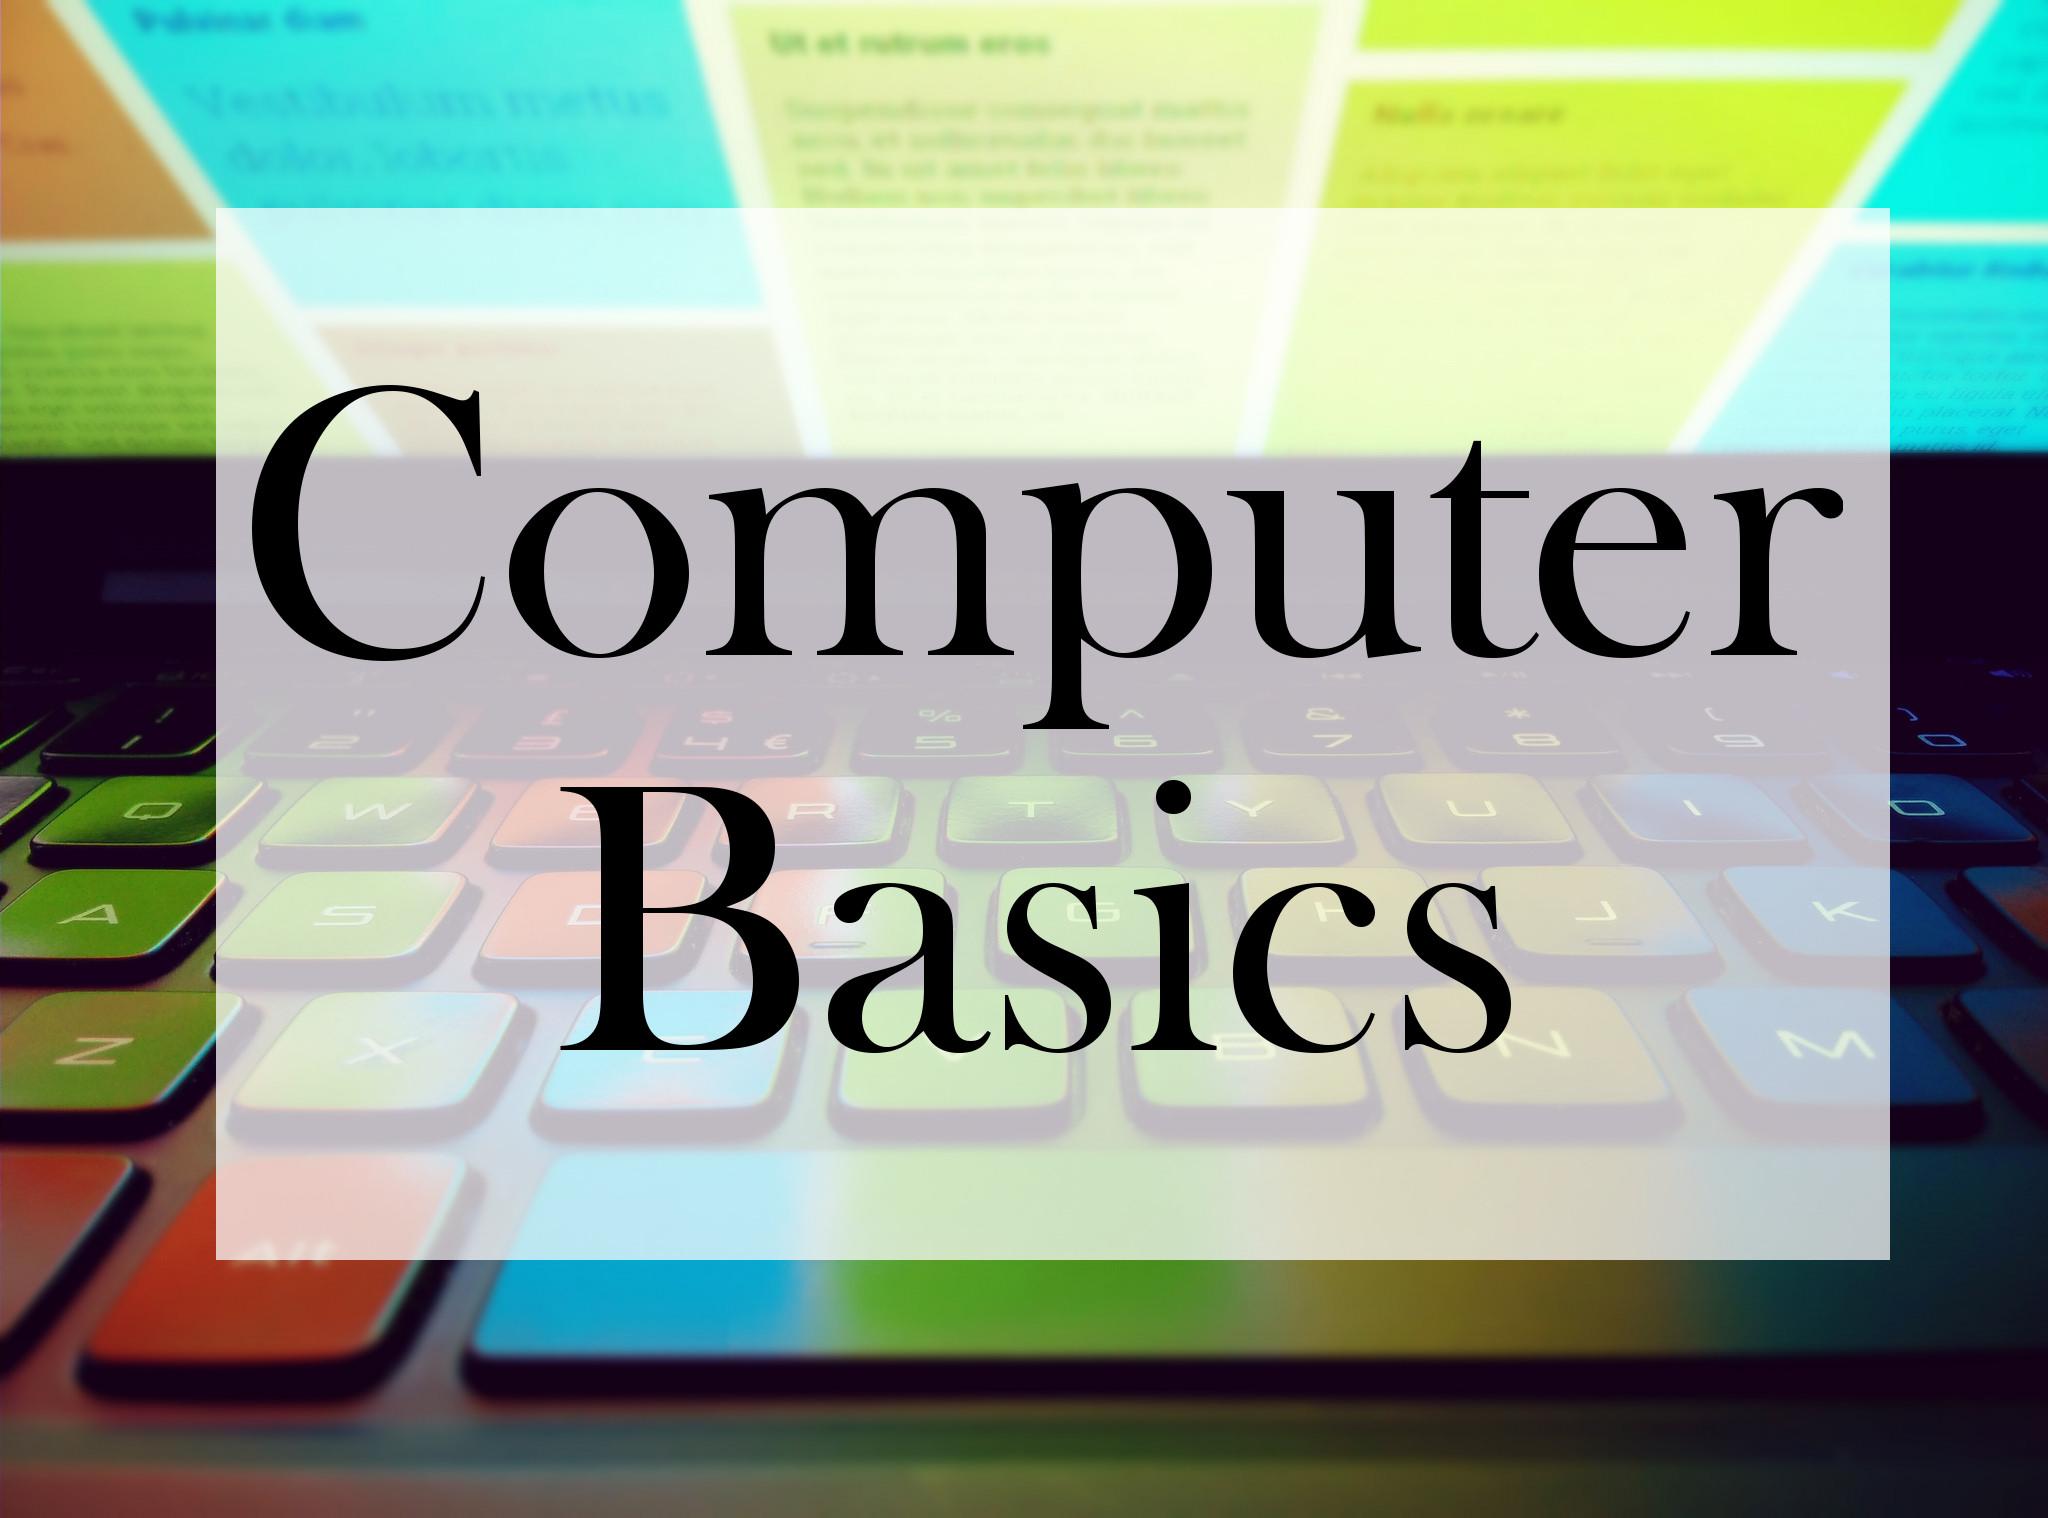 Computer Basics 101-102